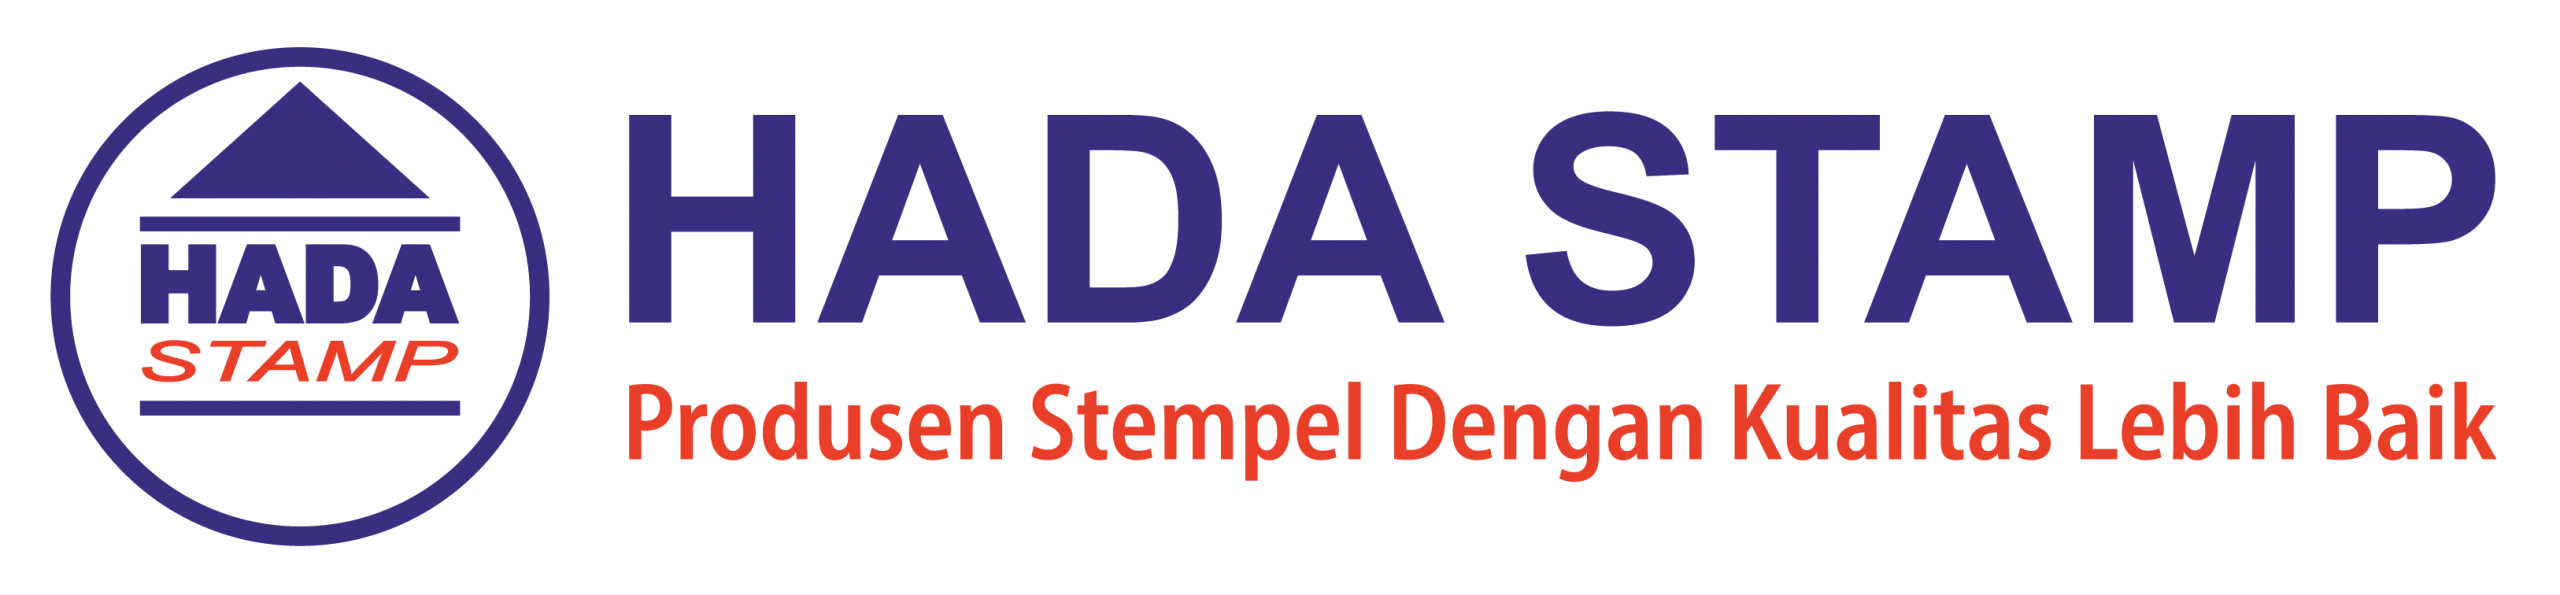 Hada Stamp Asia